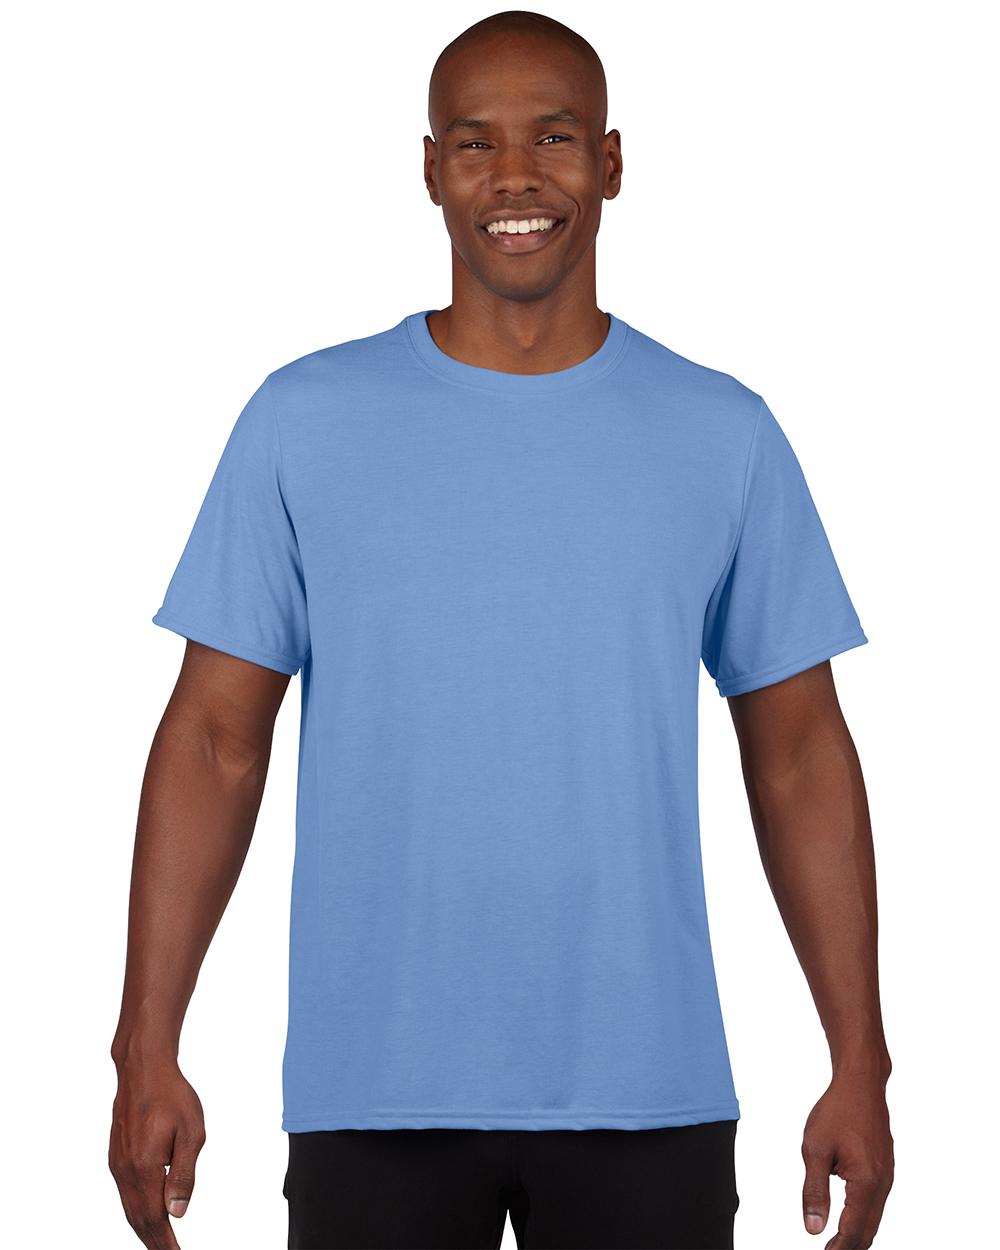 Gildan 42000     Adult Performance    4.5 oz. 100% Polyester (Cotton Feel)